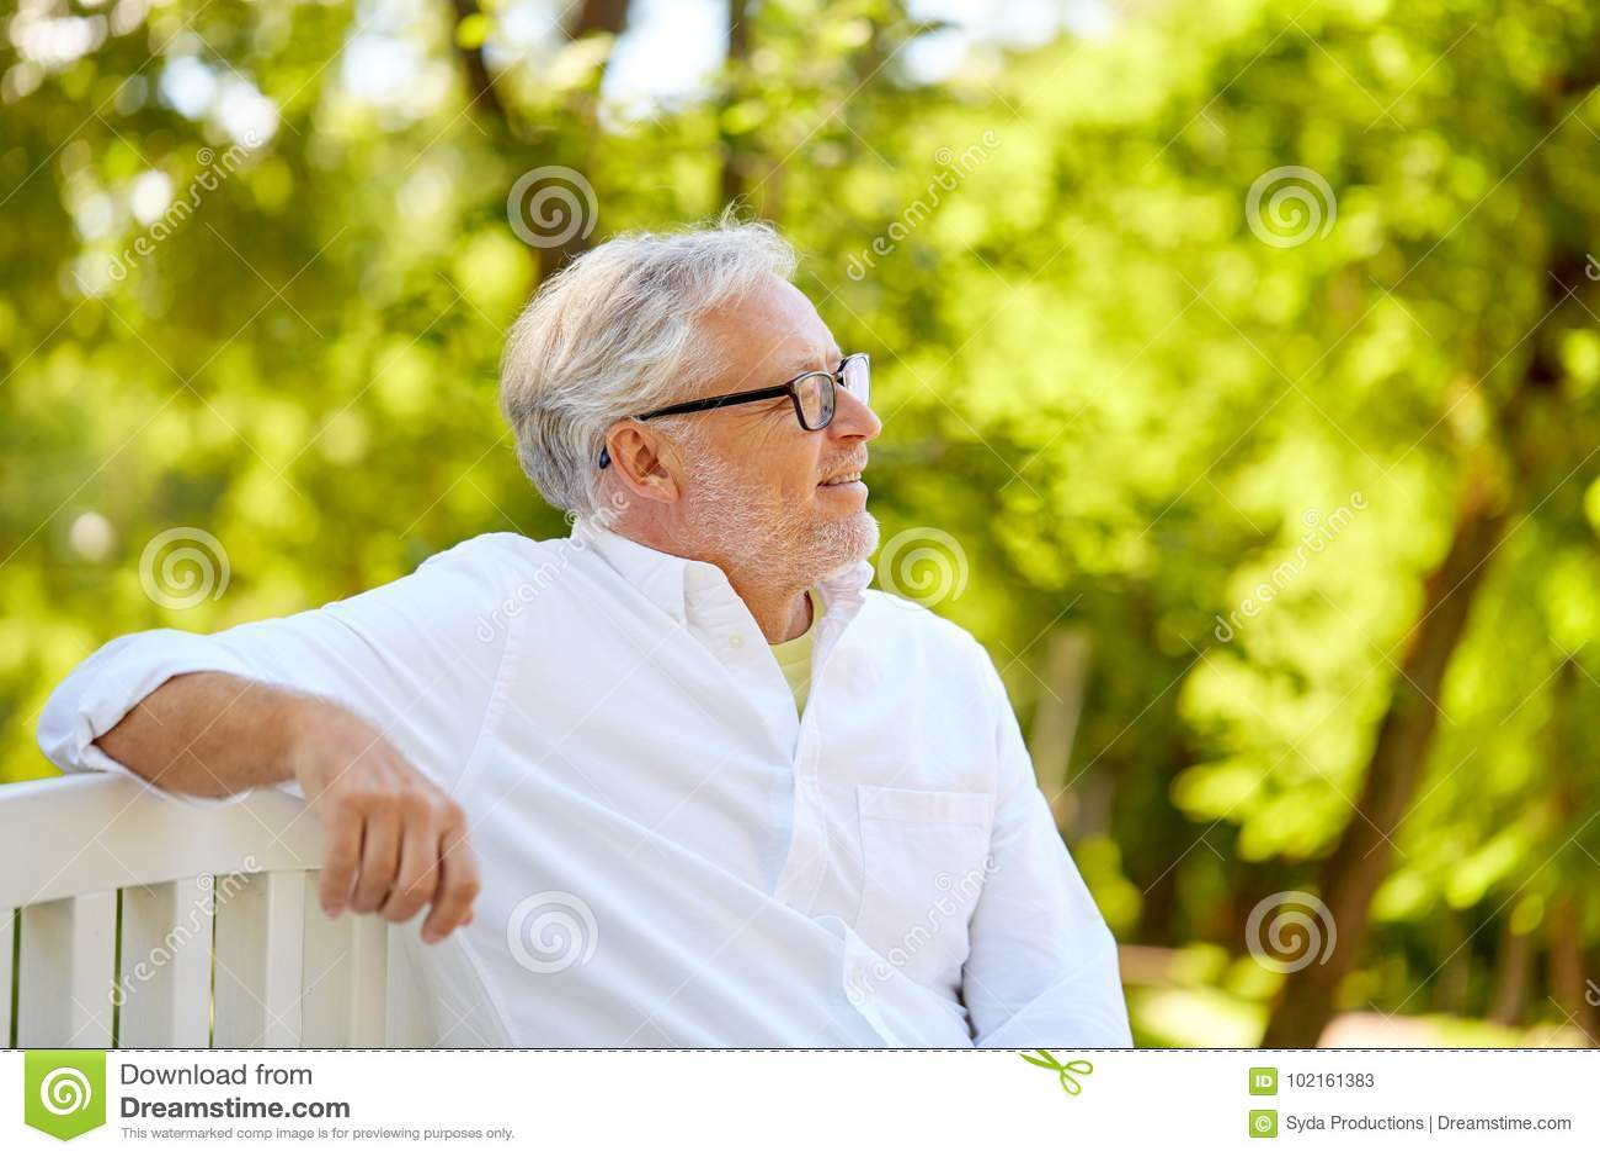 aa532bf69cf19 Happy Senior Man In Glasses Sitting At Summer Park Stock Image ...